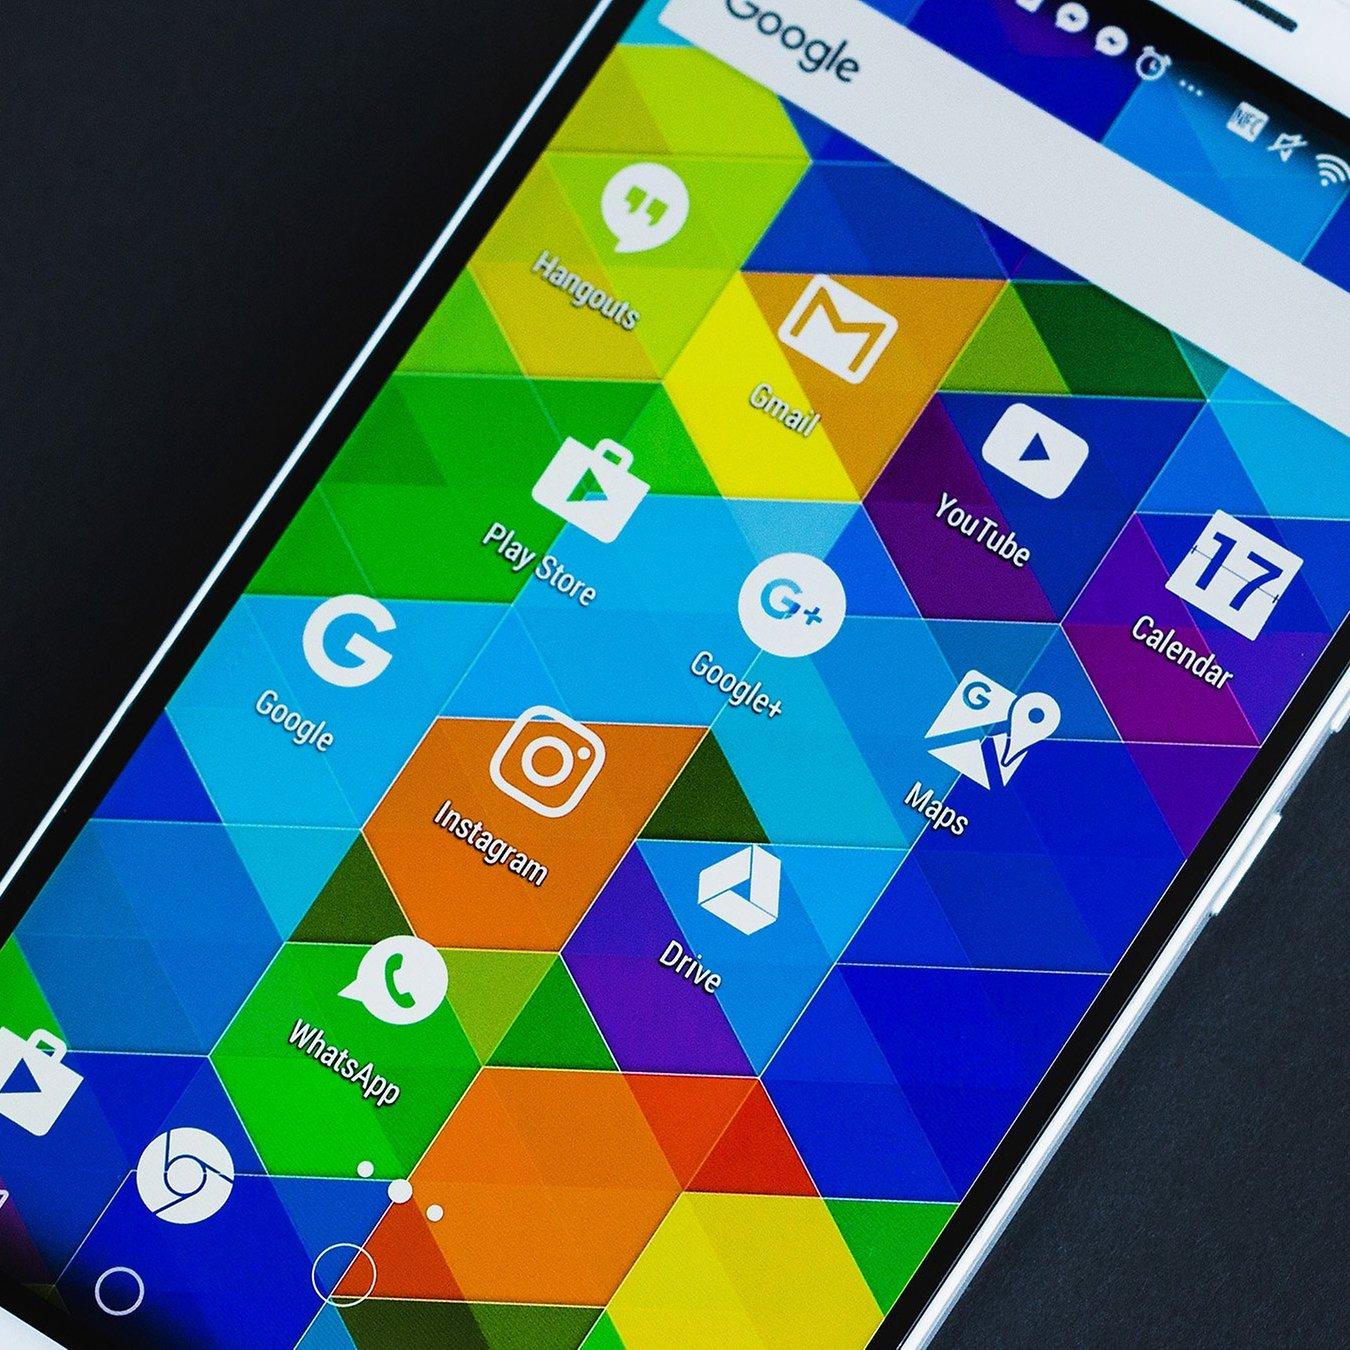 Como personalizar o seu Android: o guia completo | AndroidPIT